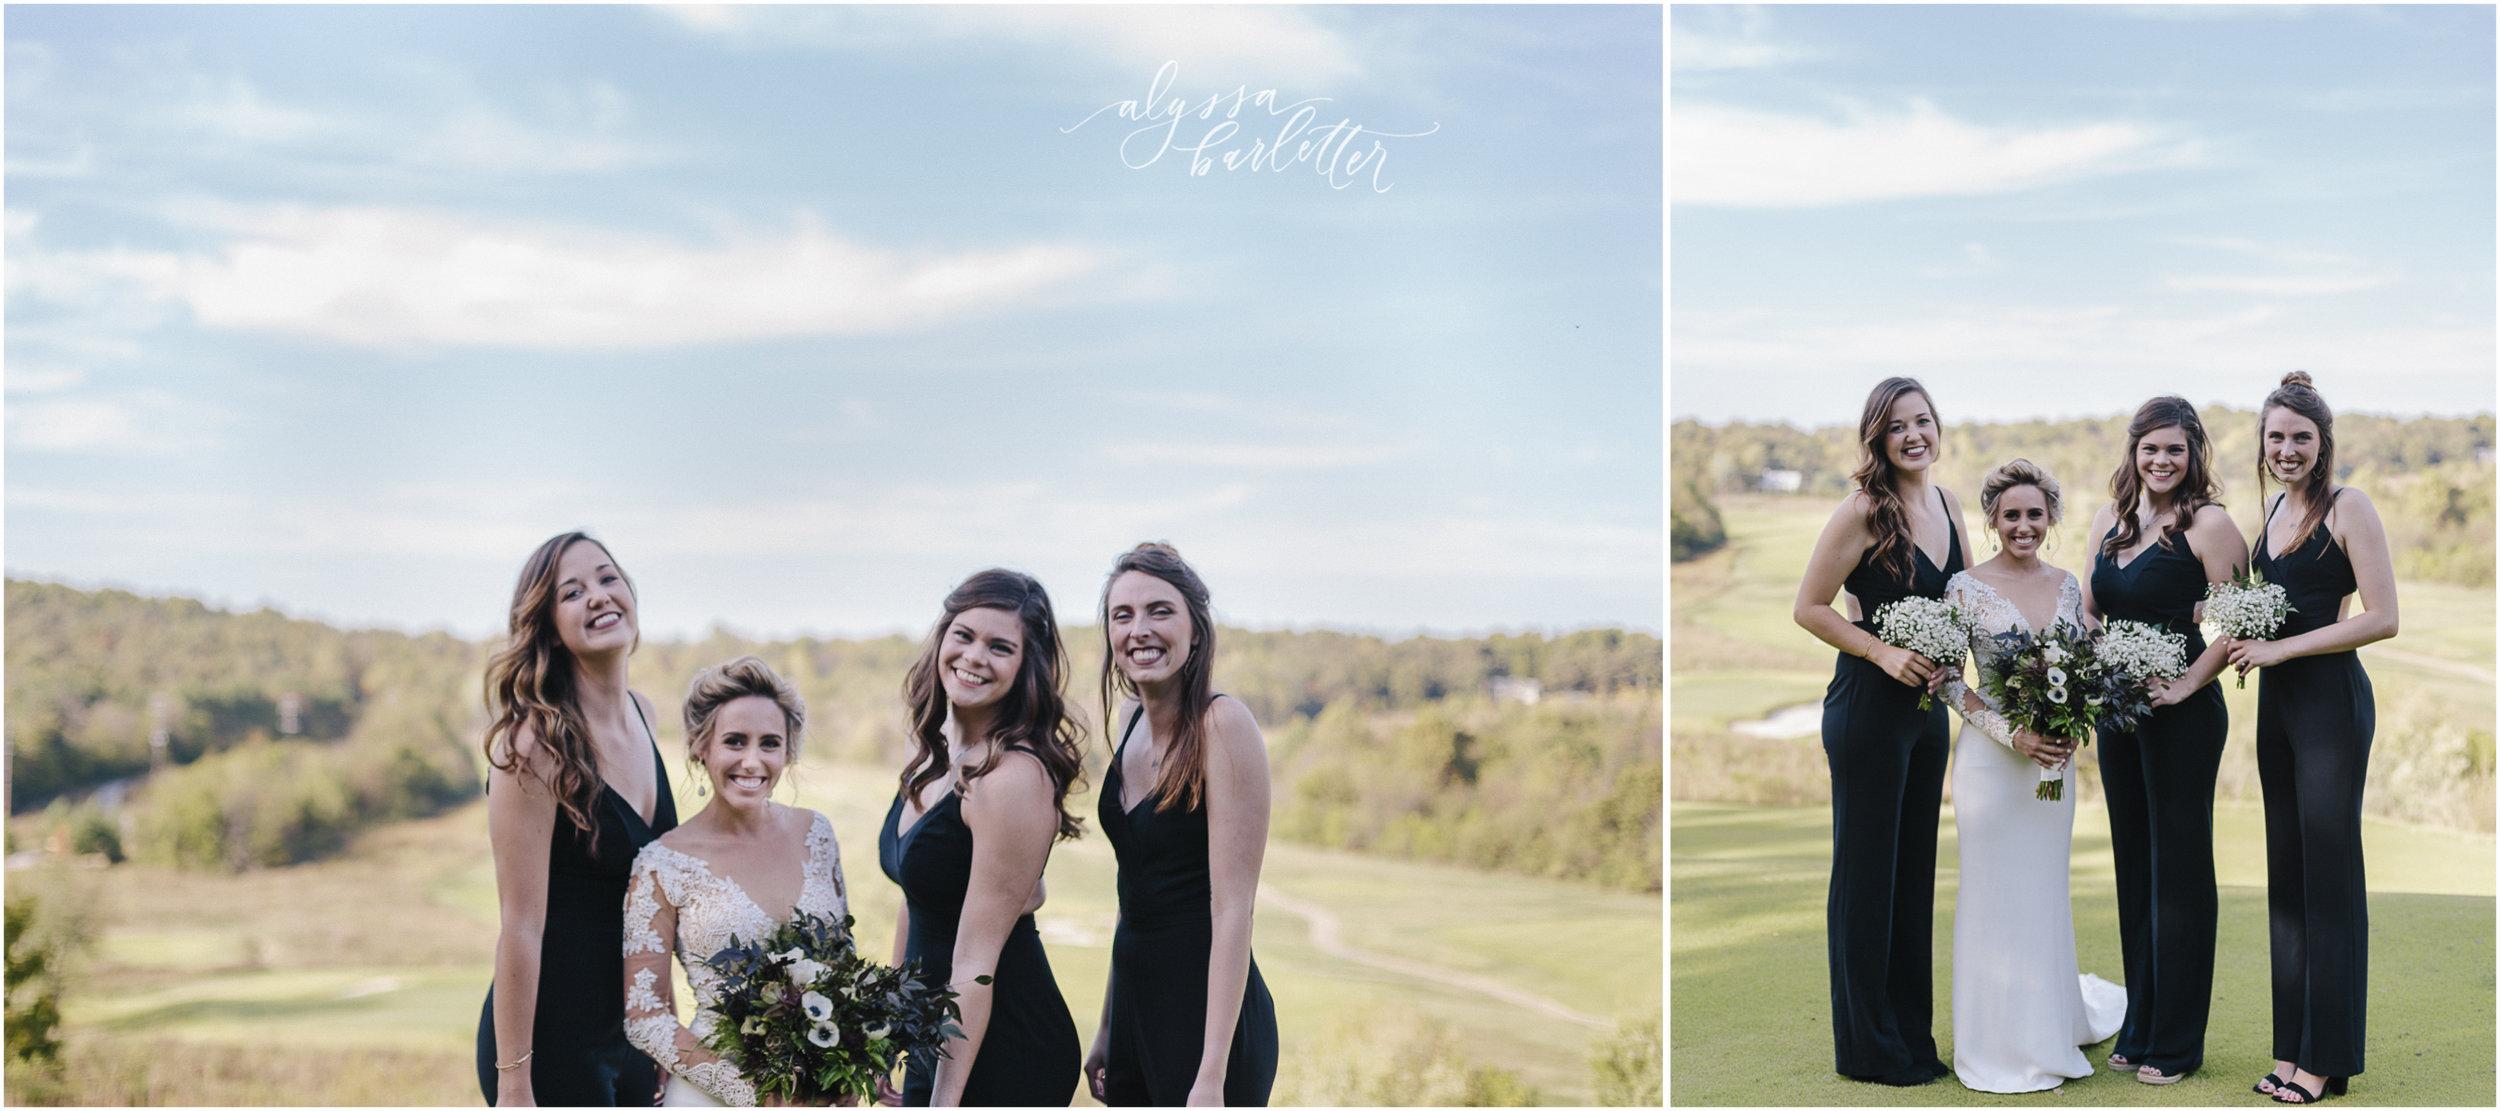 alyssa barletter photography fayetteville arkansas wedding photos micah and colin-1-38.jpg